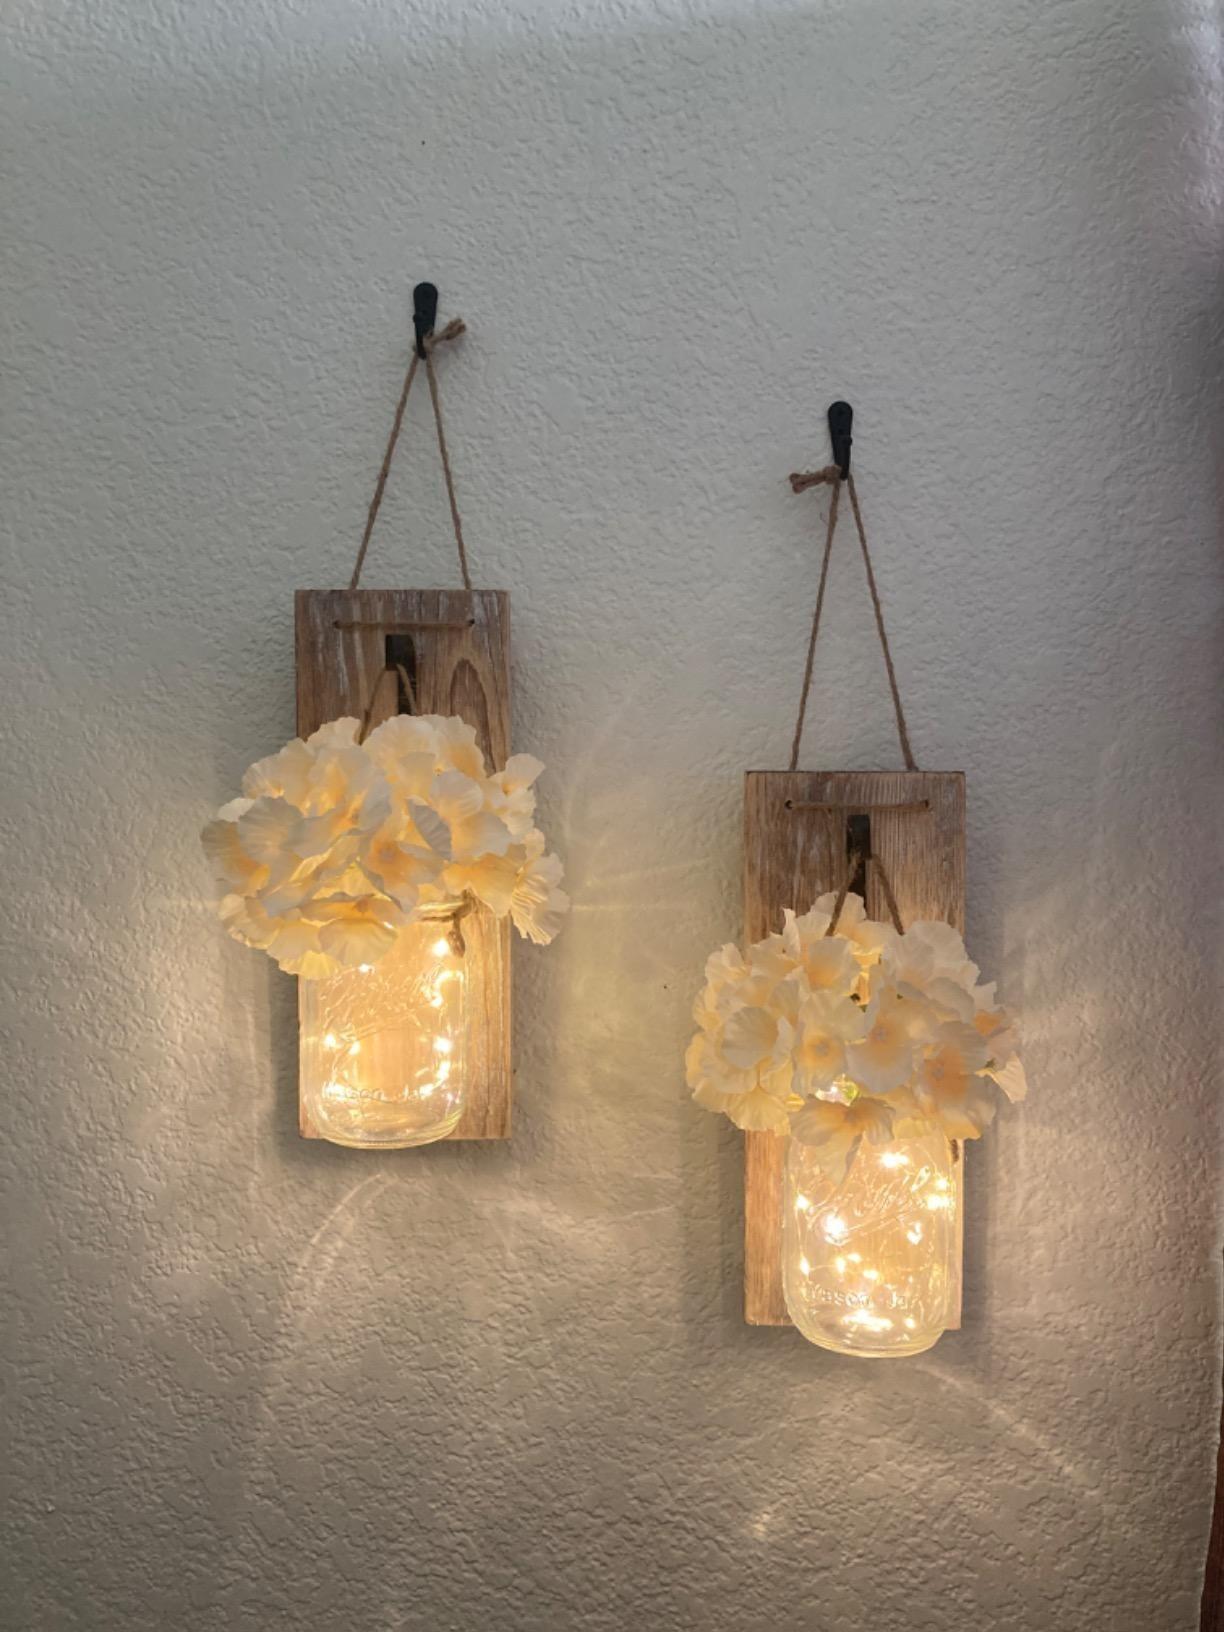 Mason jar lights hanging on wall